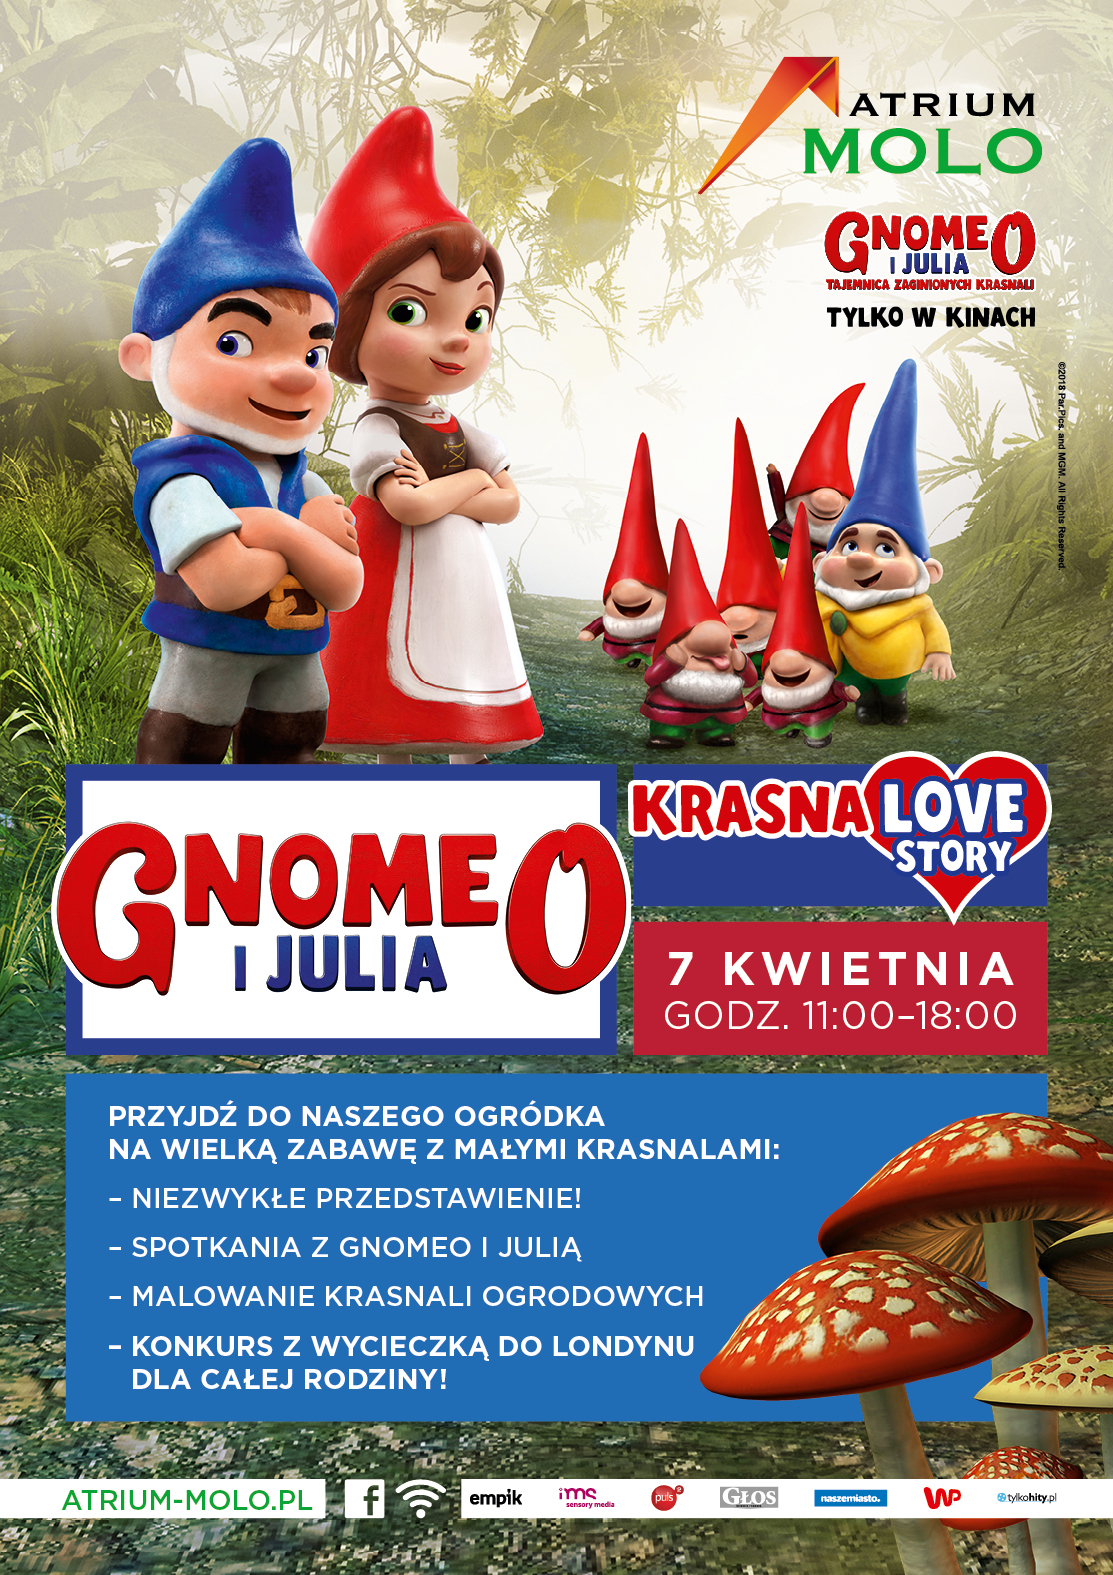 Gnomeo iJulia